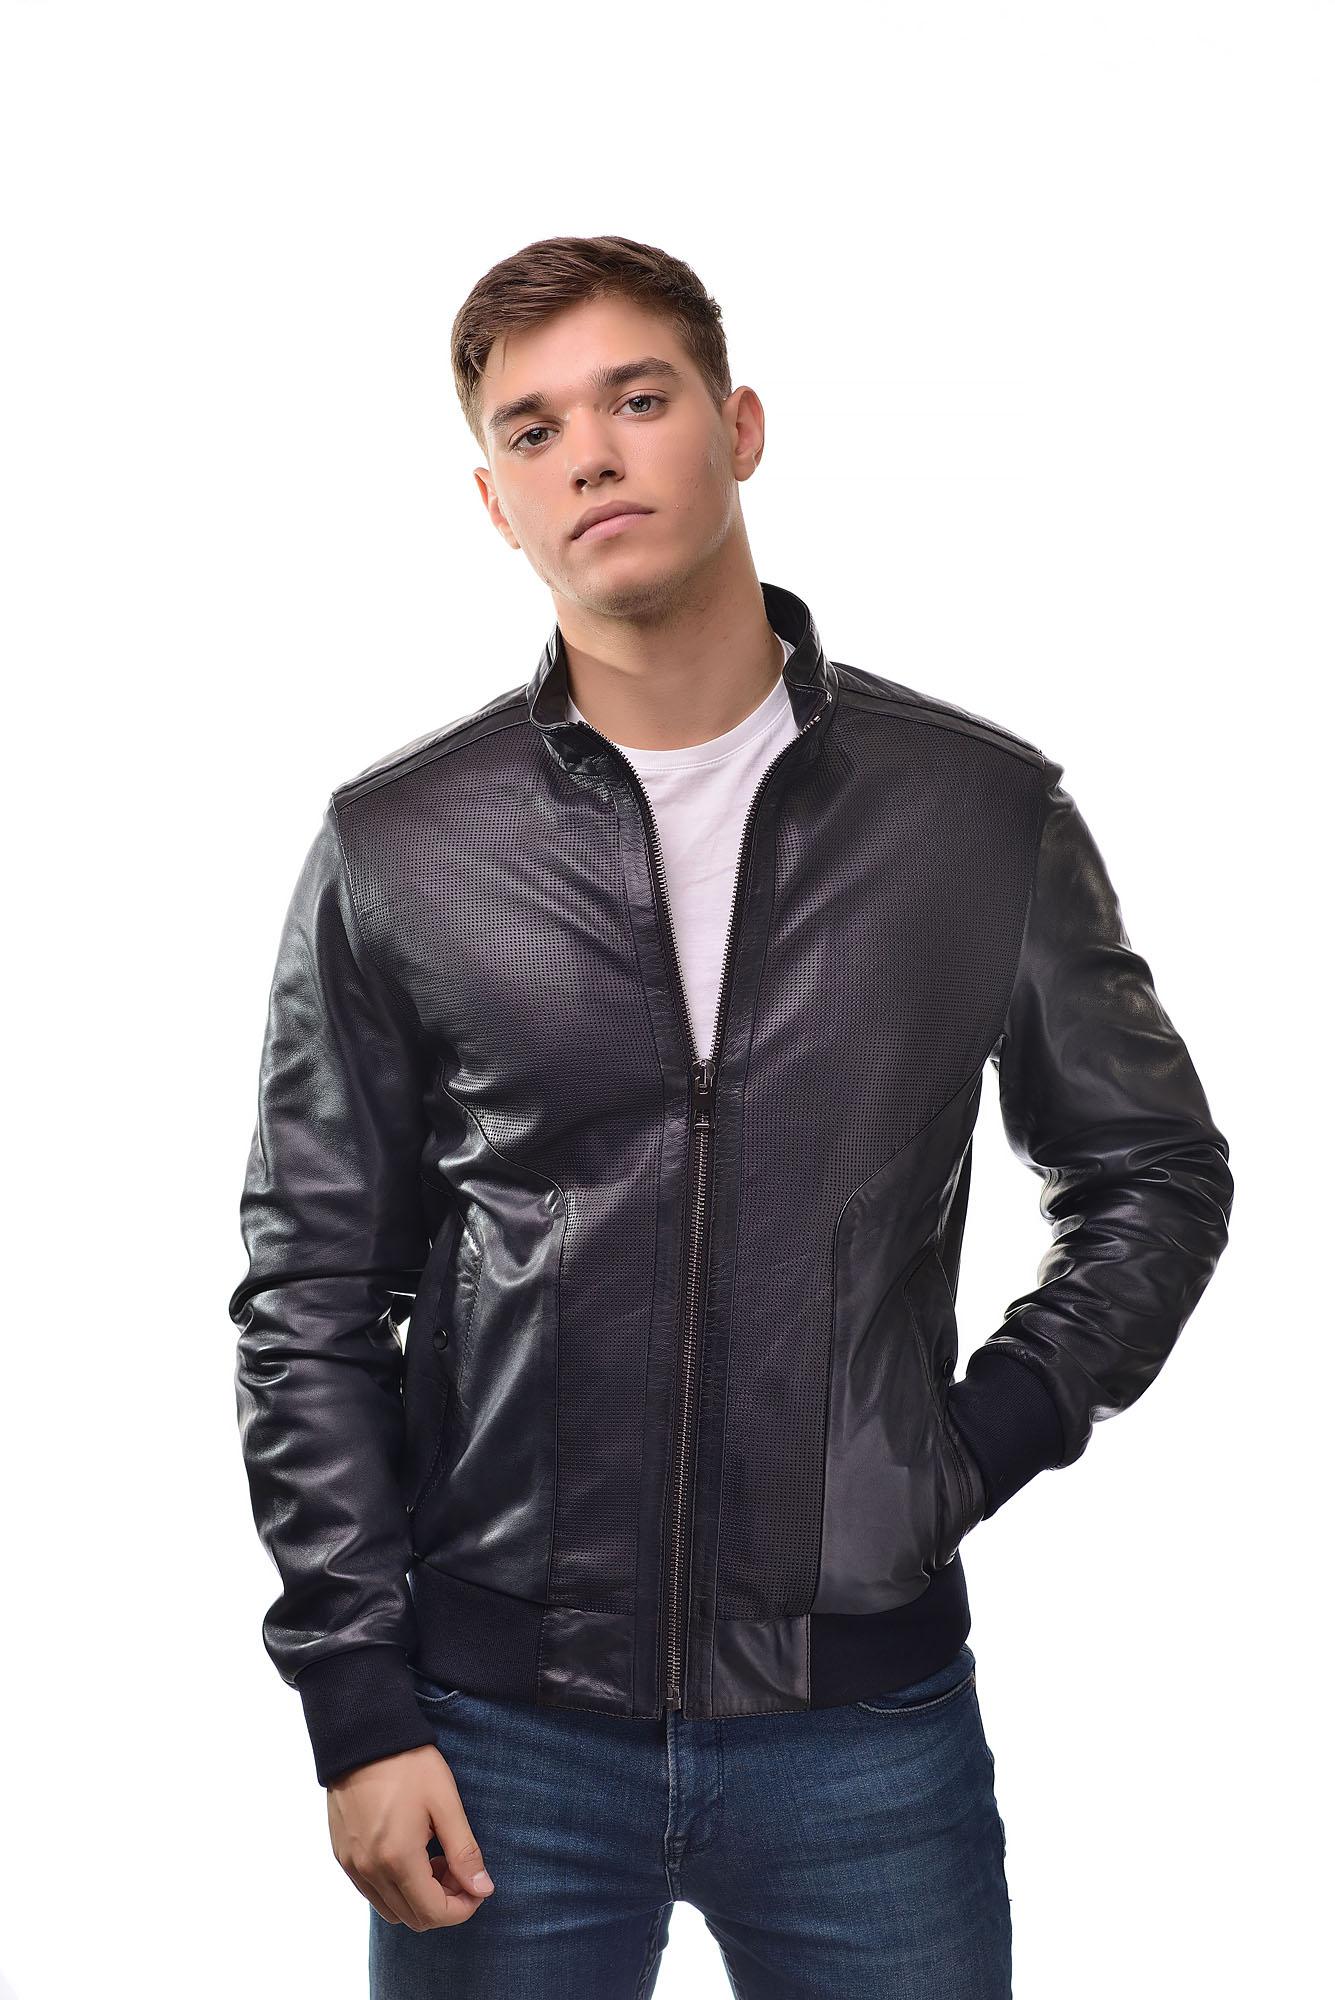 Мужская Кожана куртка Z-310(Синий)